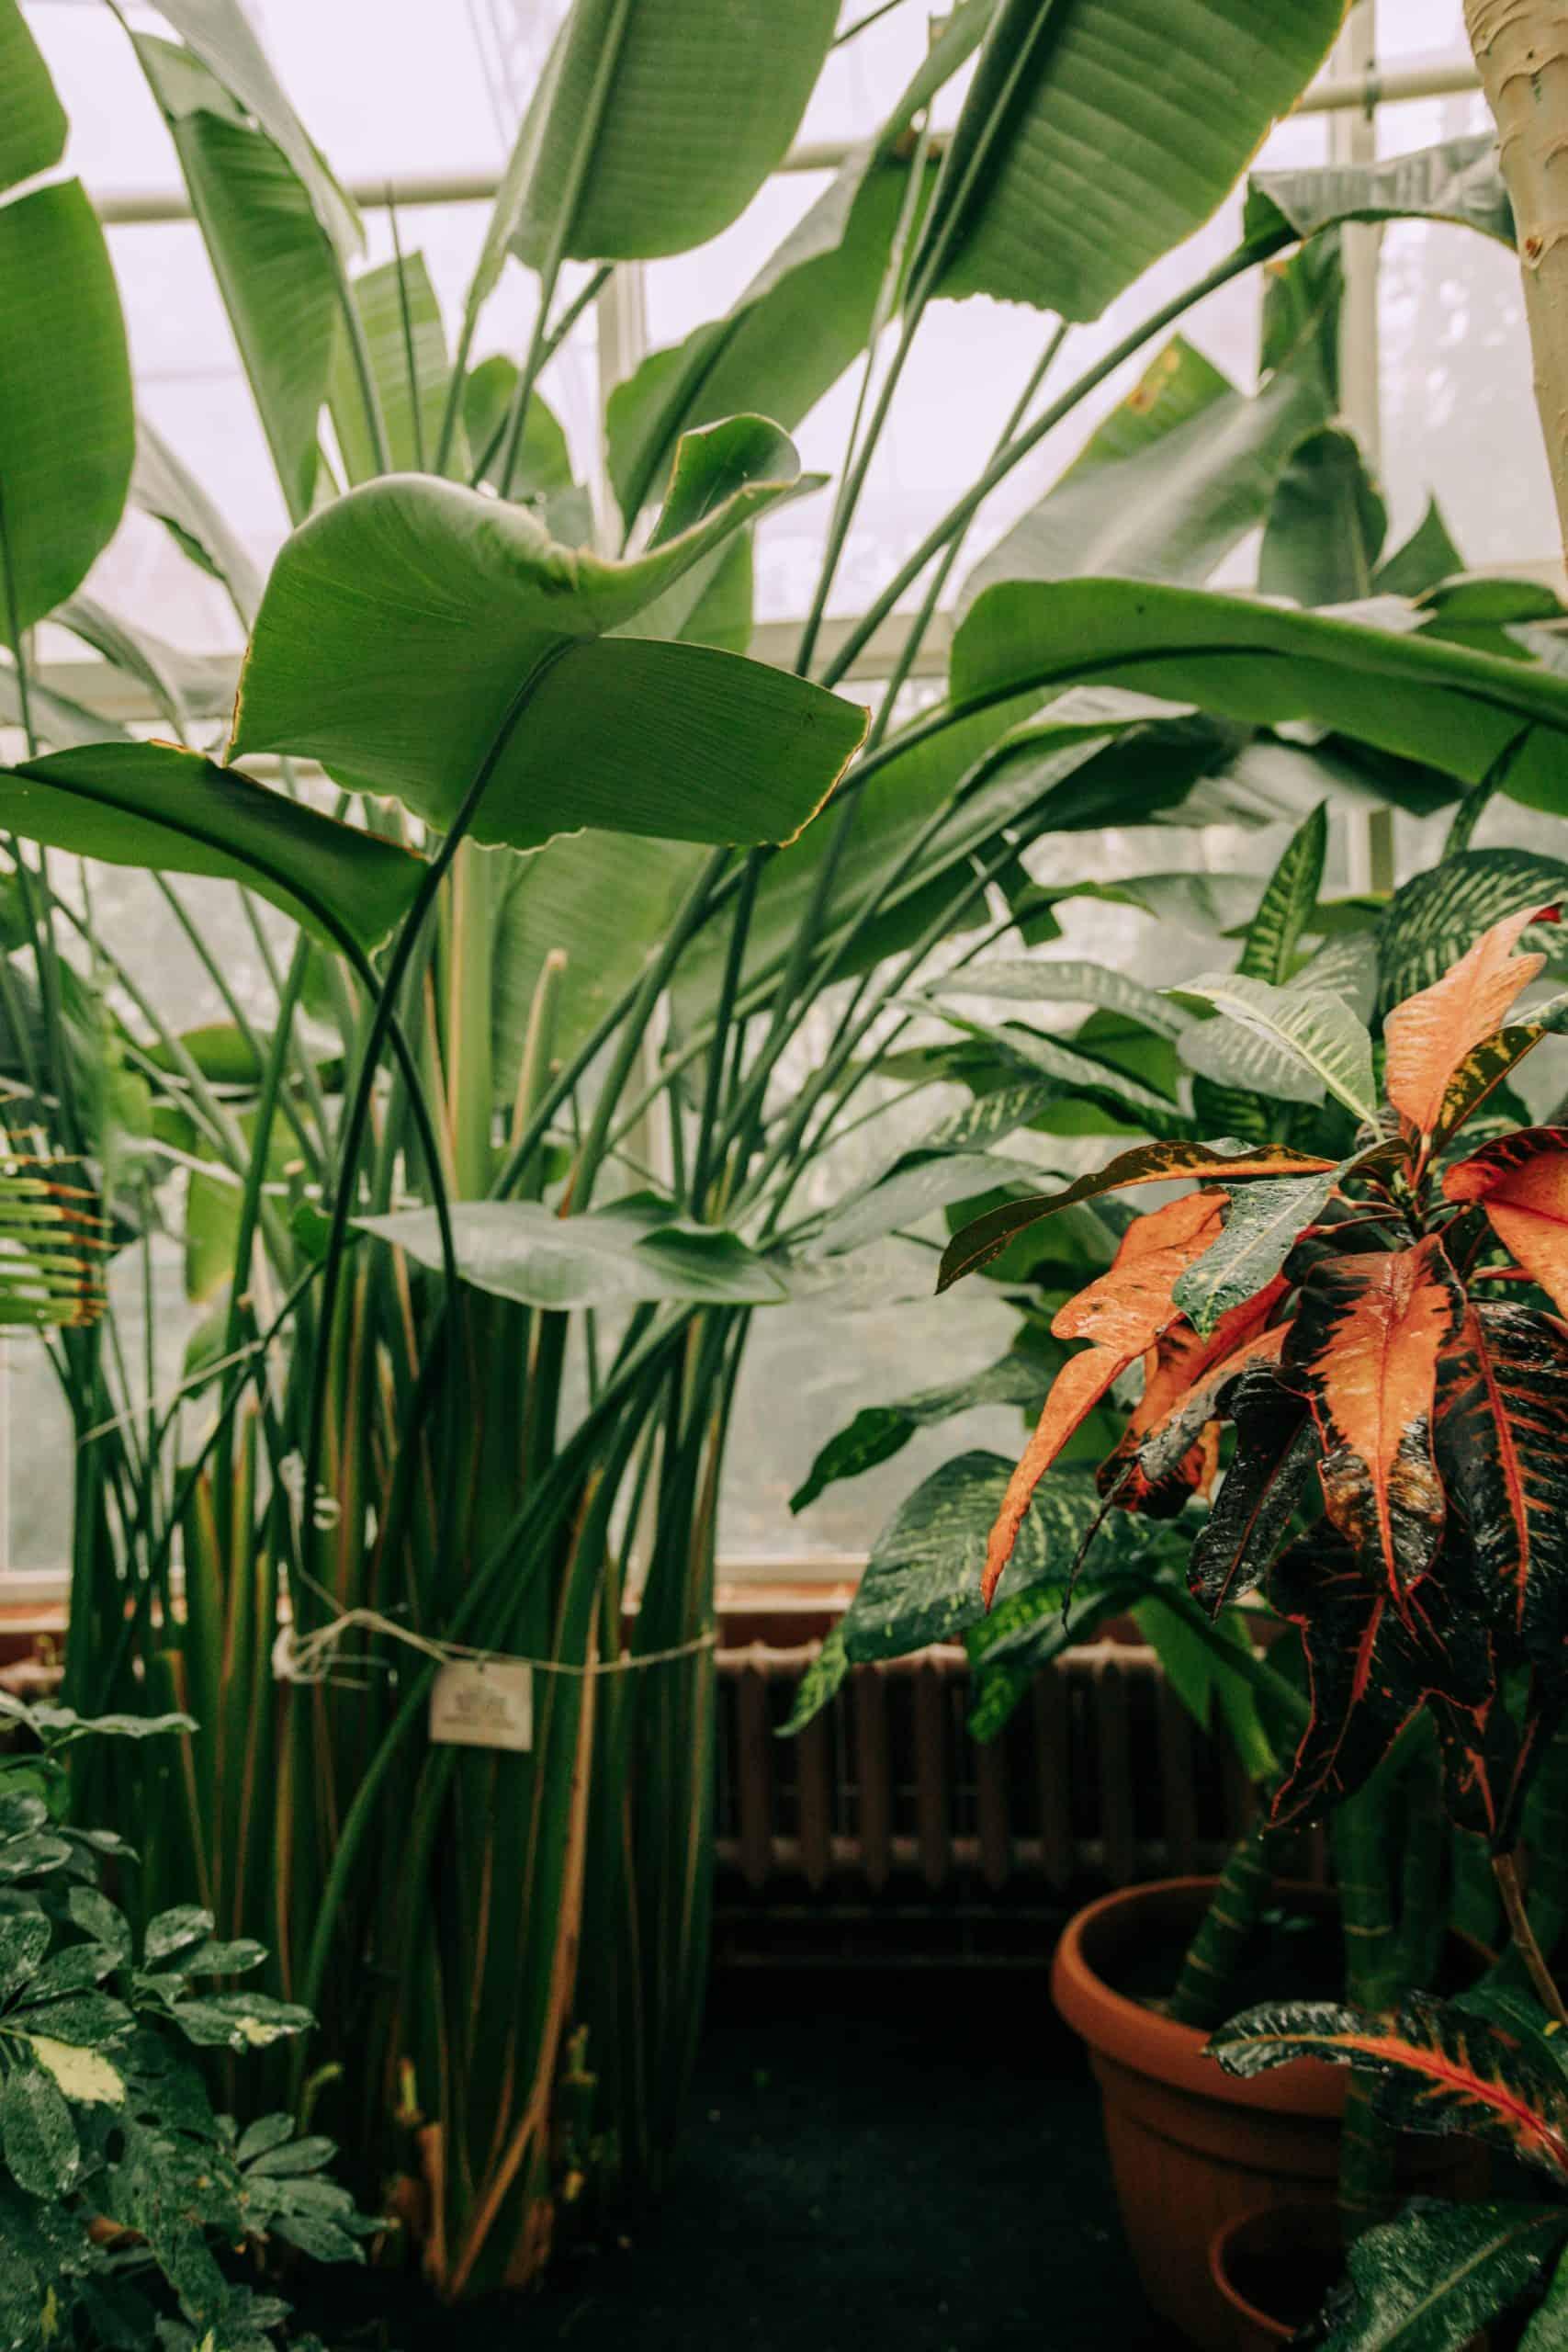 lifestyle home garden trend report 2021 garden nursery plant shop johannesburg gauteng pantone fashion edit decor colour bloom flowers